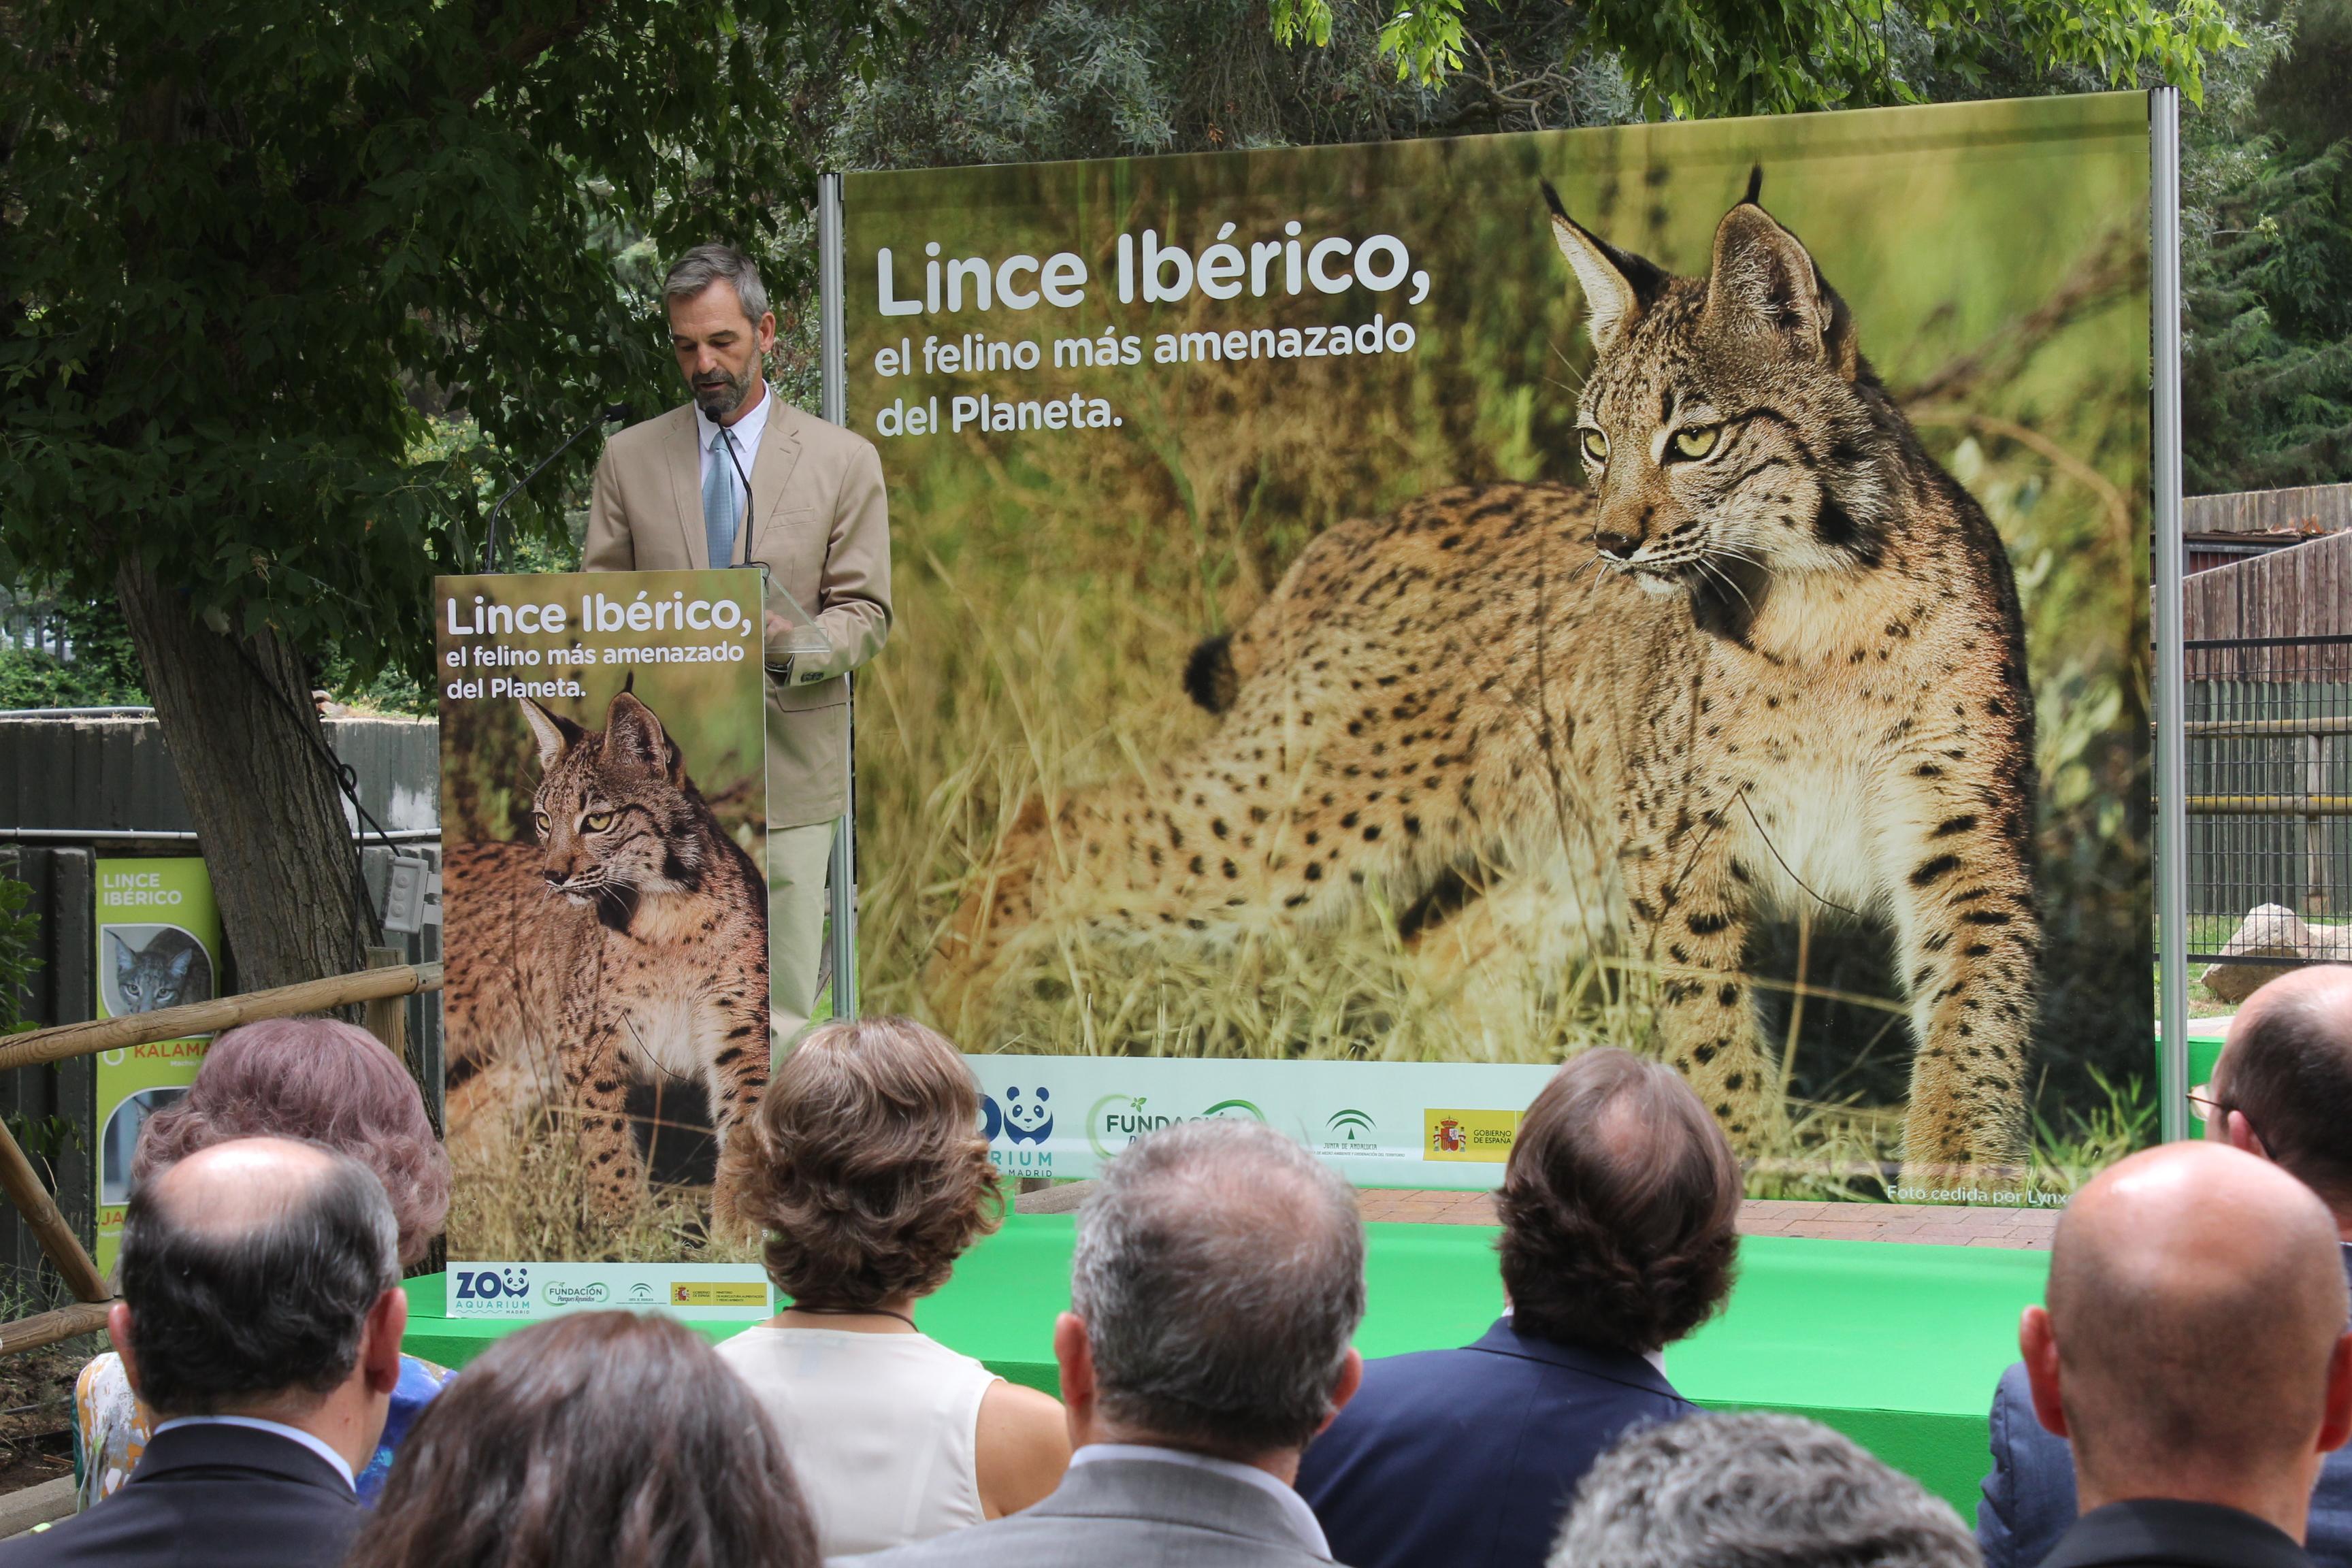 zoo-aquarium-madrid-evento-lince-iberico4_tcm7-427446